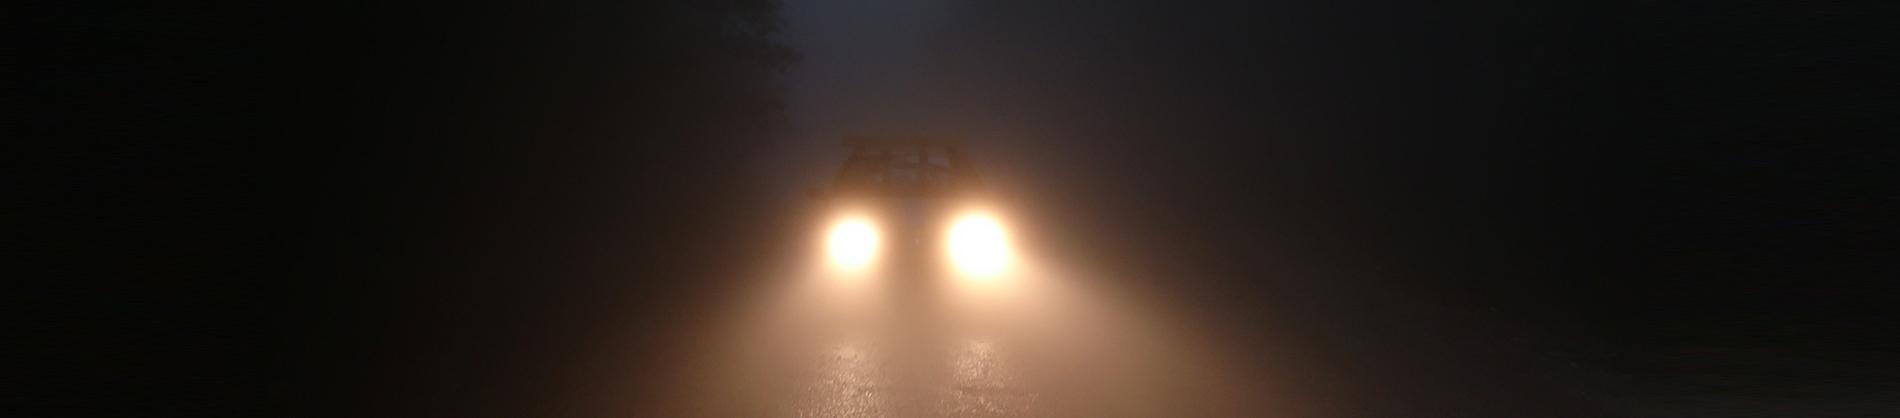 Car headlights on a dark road